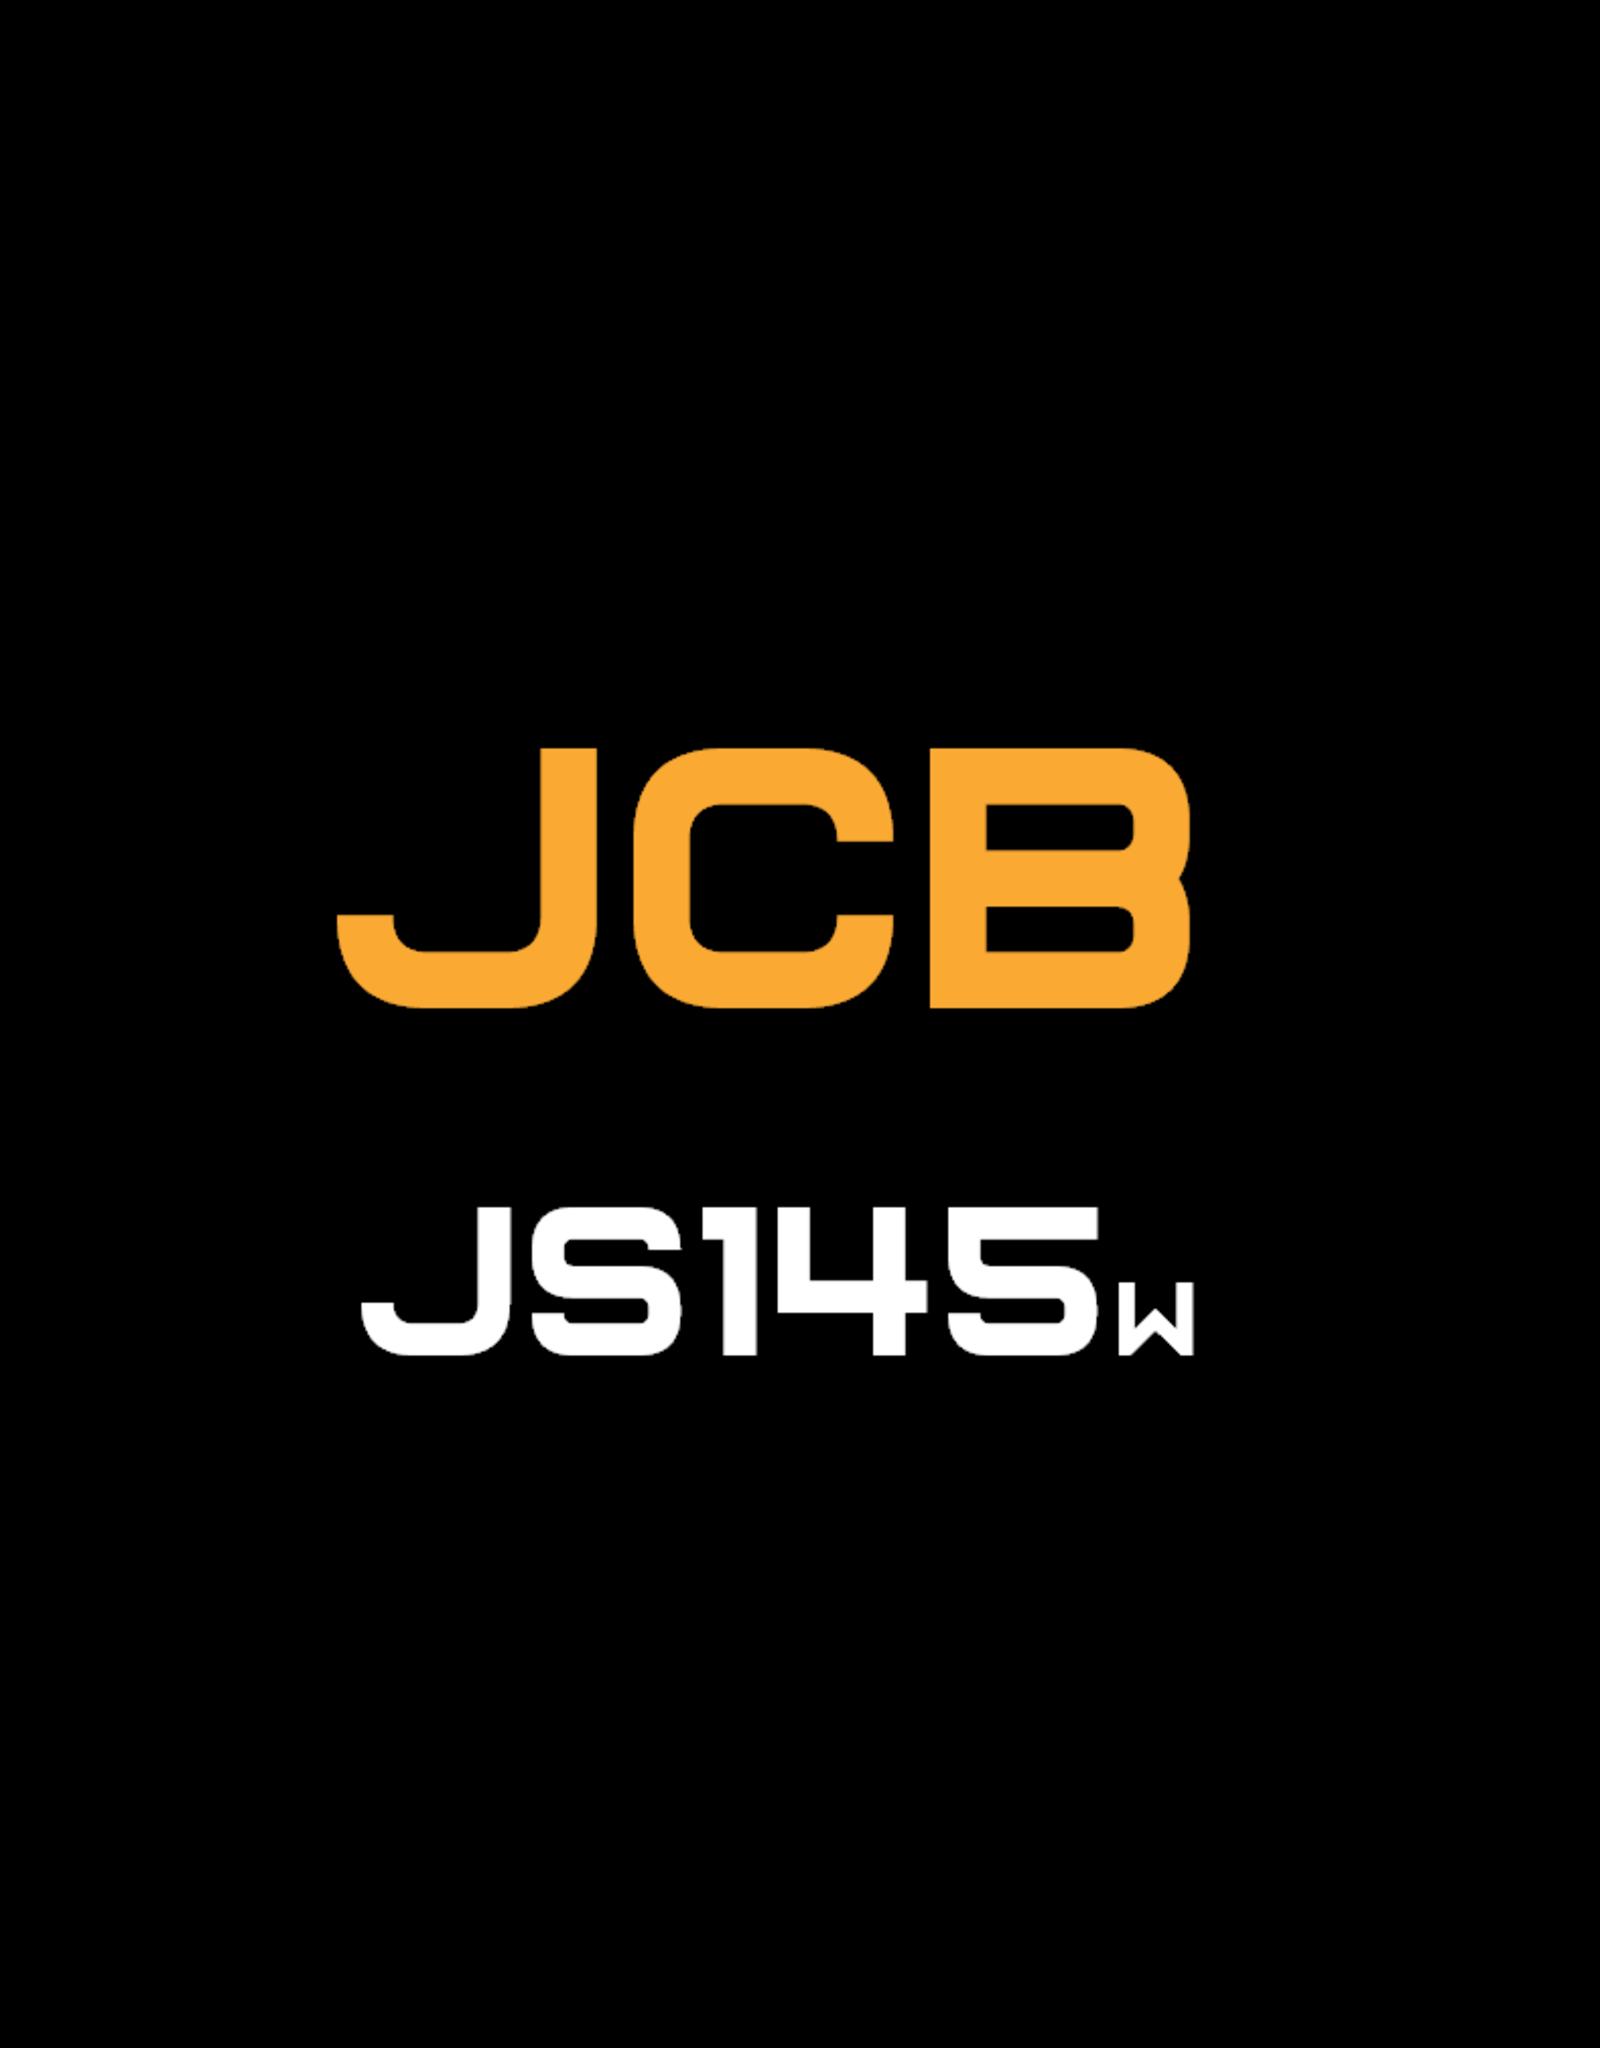 Echle Hartstahl GmbH FOPS für JCB JS145W